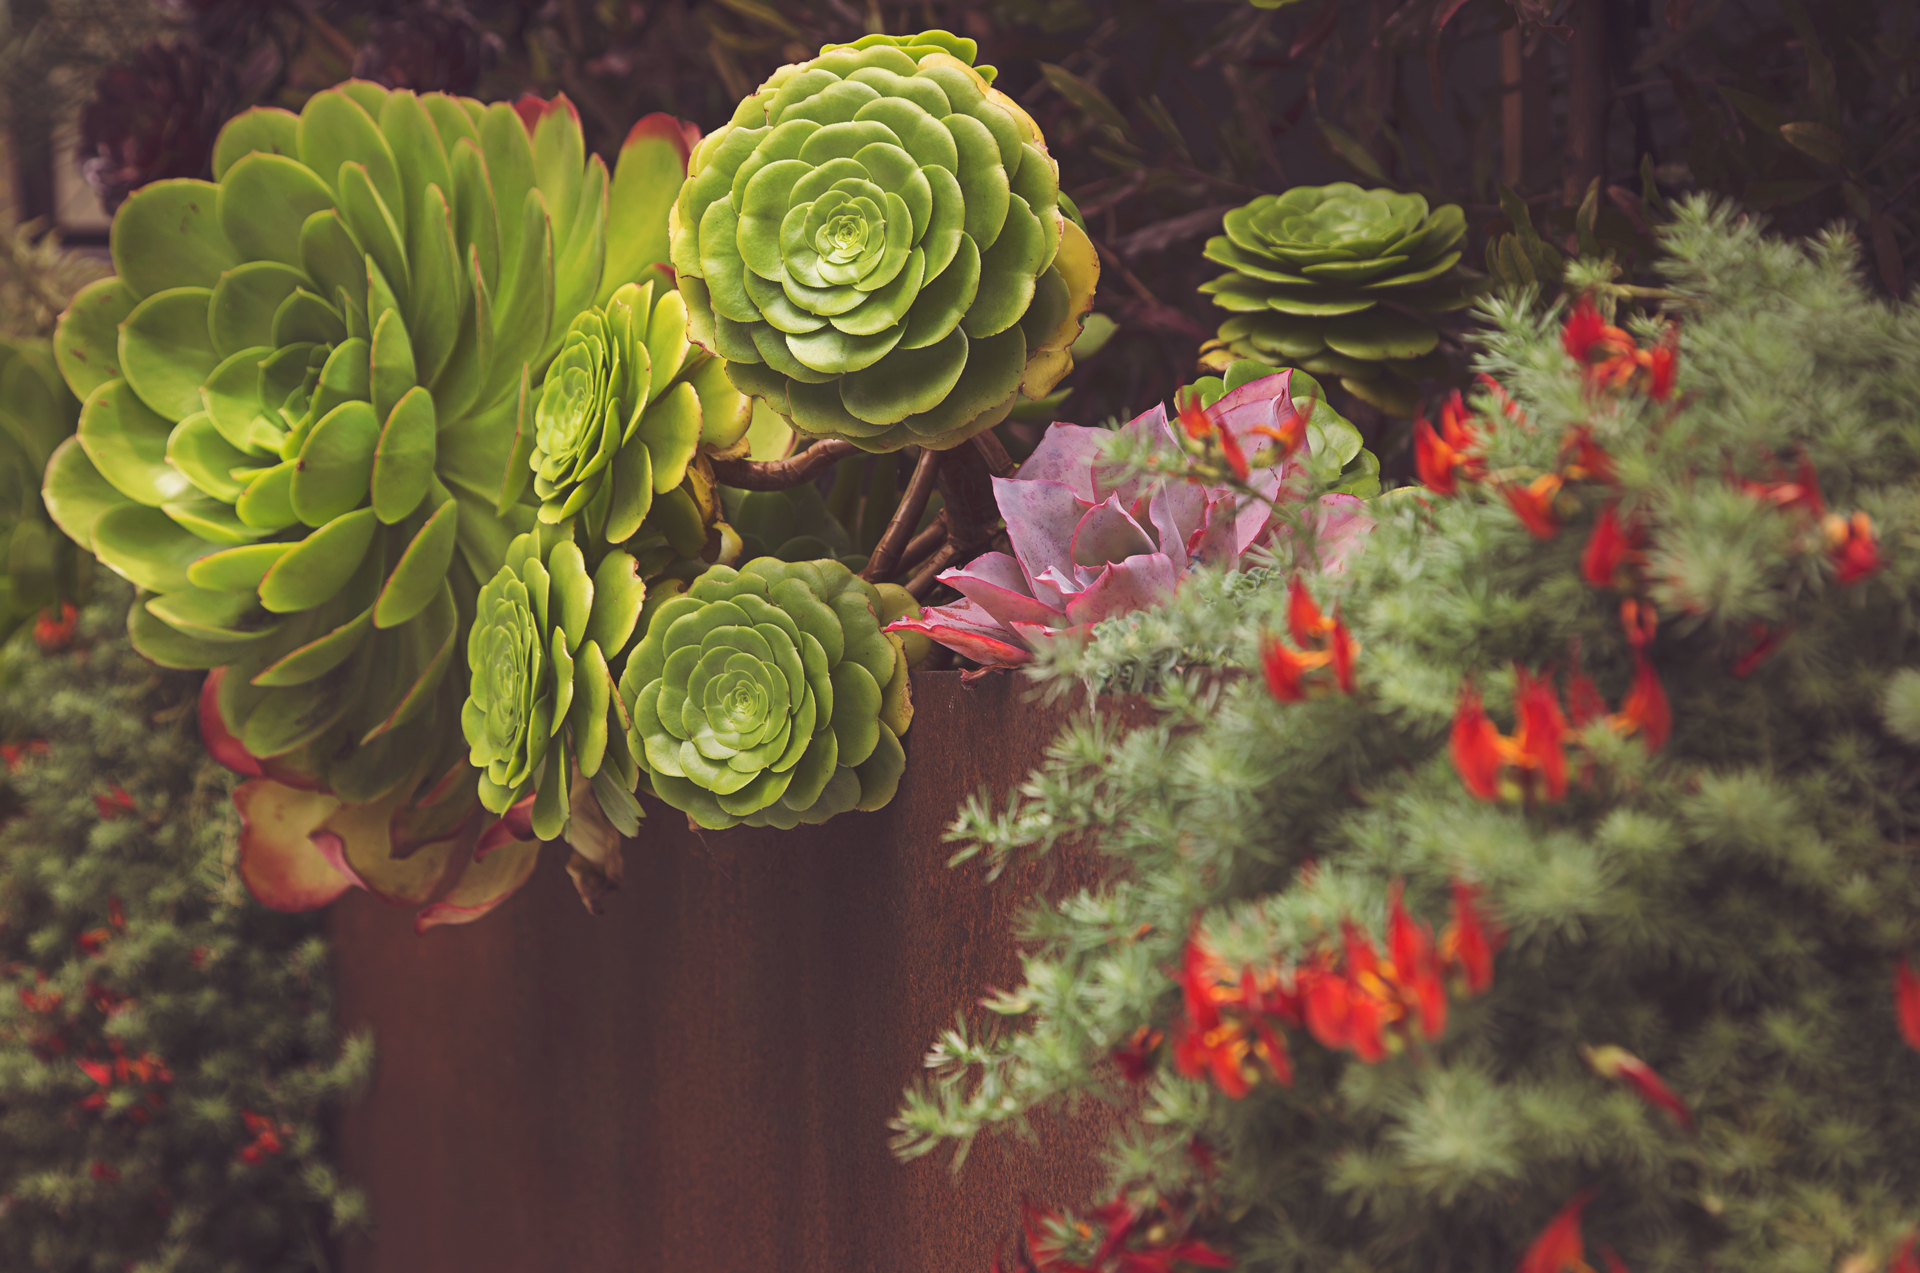 flowers-and-succulents-san-francisco-patrick-sanders.jpg